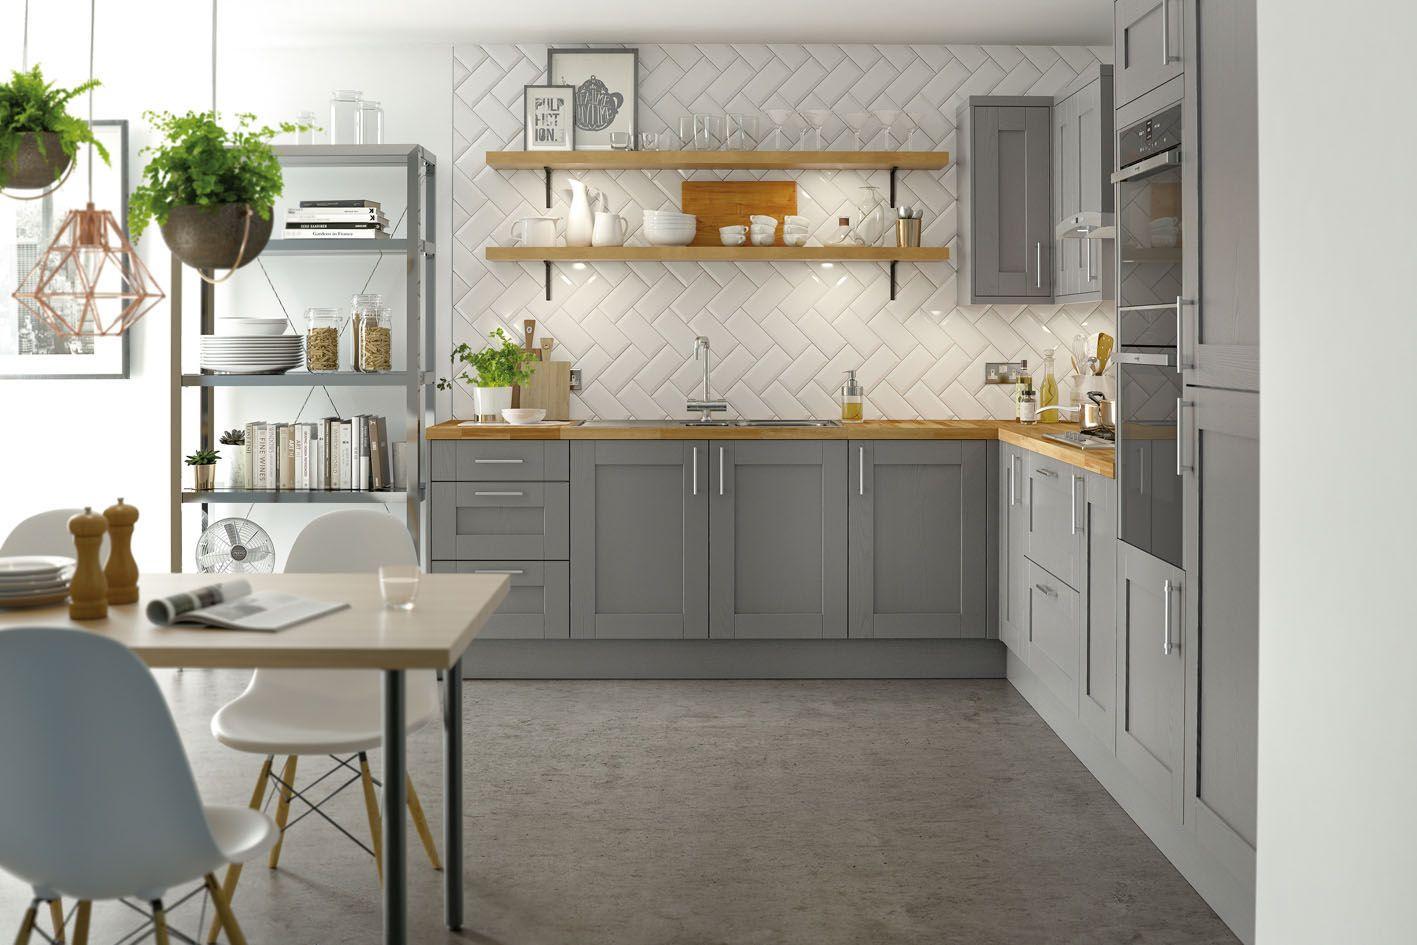 Steamer kitchens in Cornstarch & Wholegrain at Homebase.co